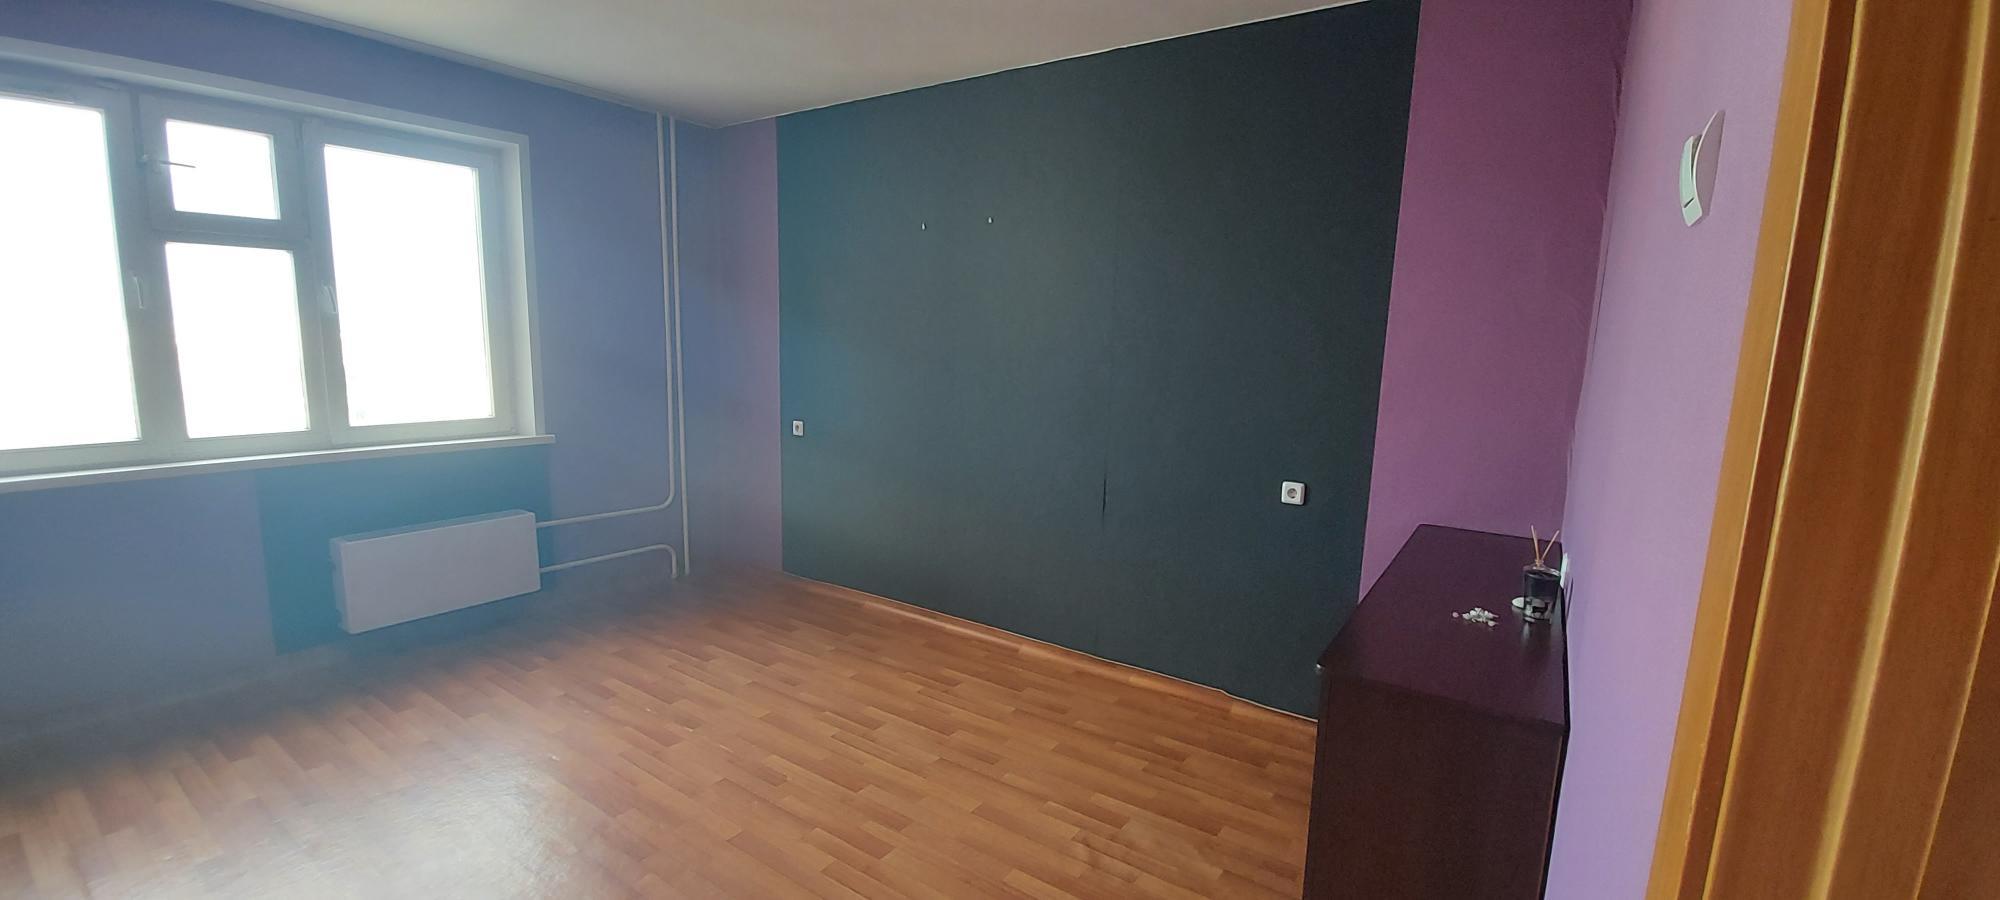 2к квартира улица Михаила Годенко, 1   23000   аренда в Красноярске фото 2